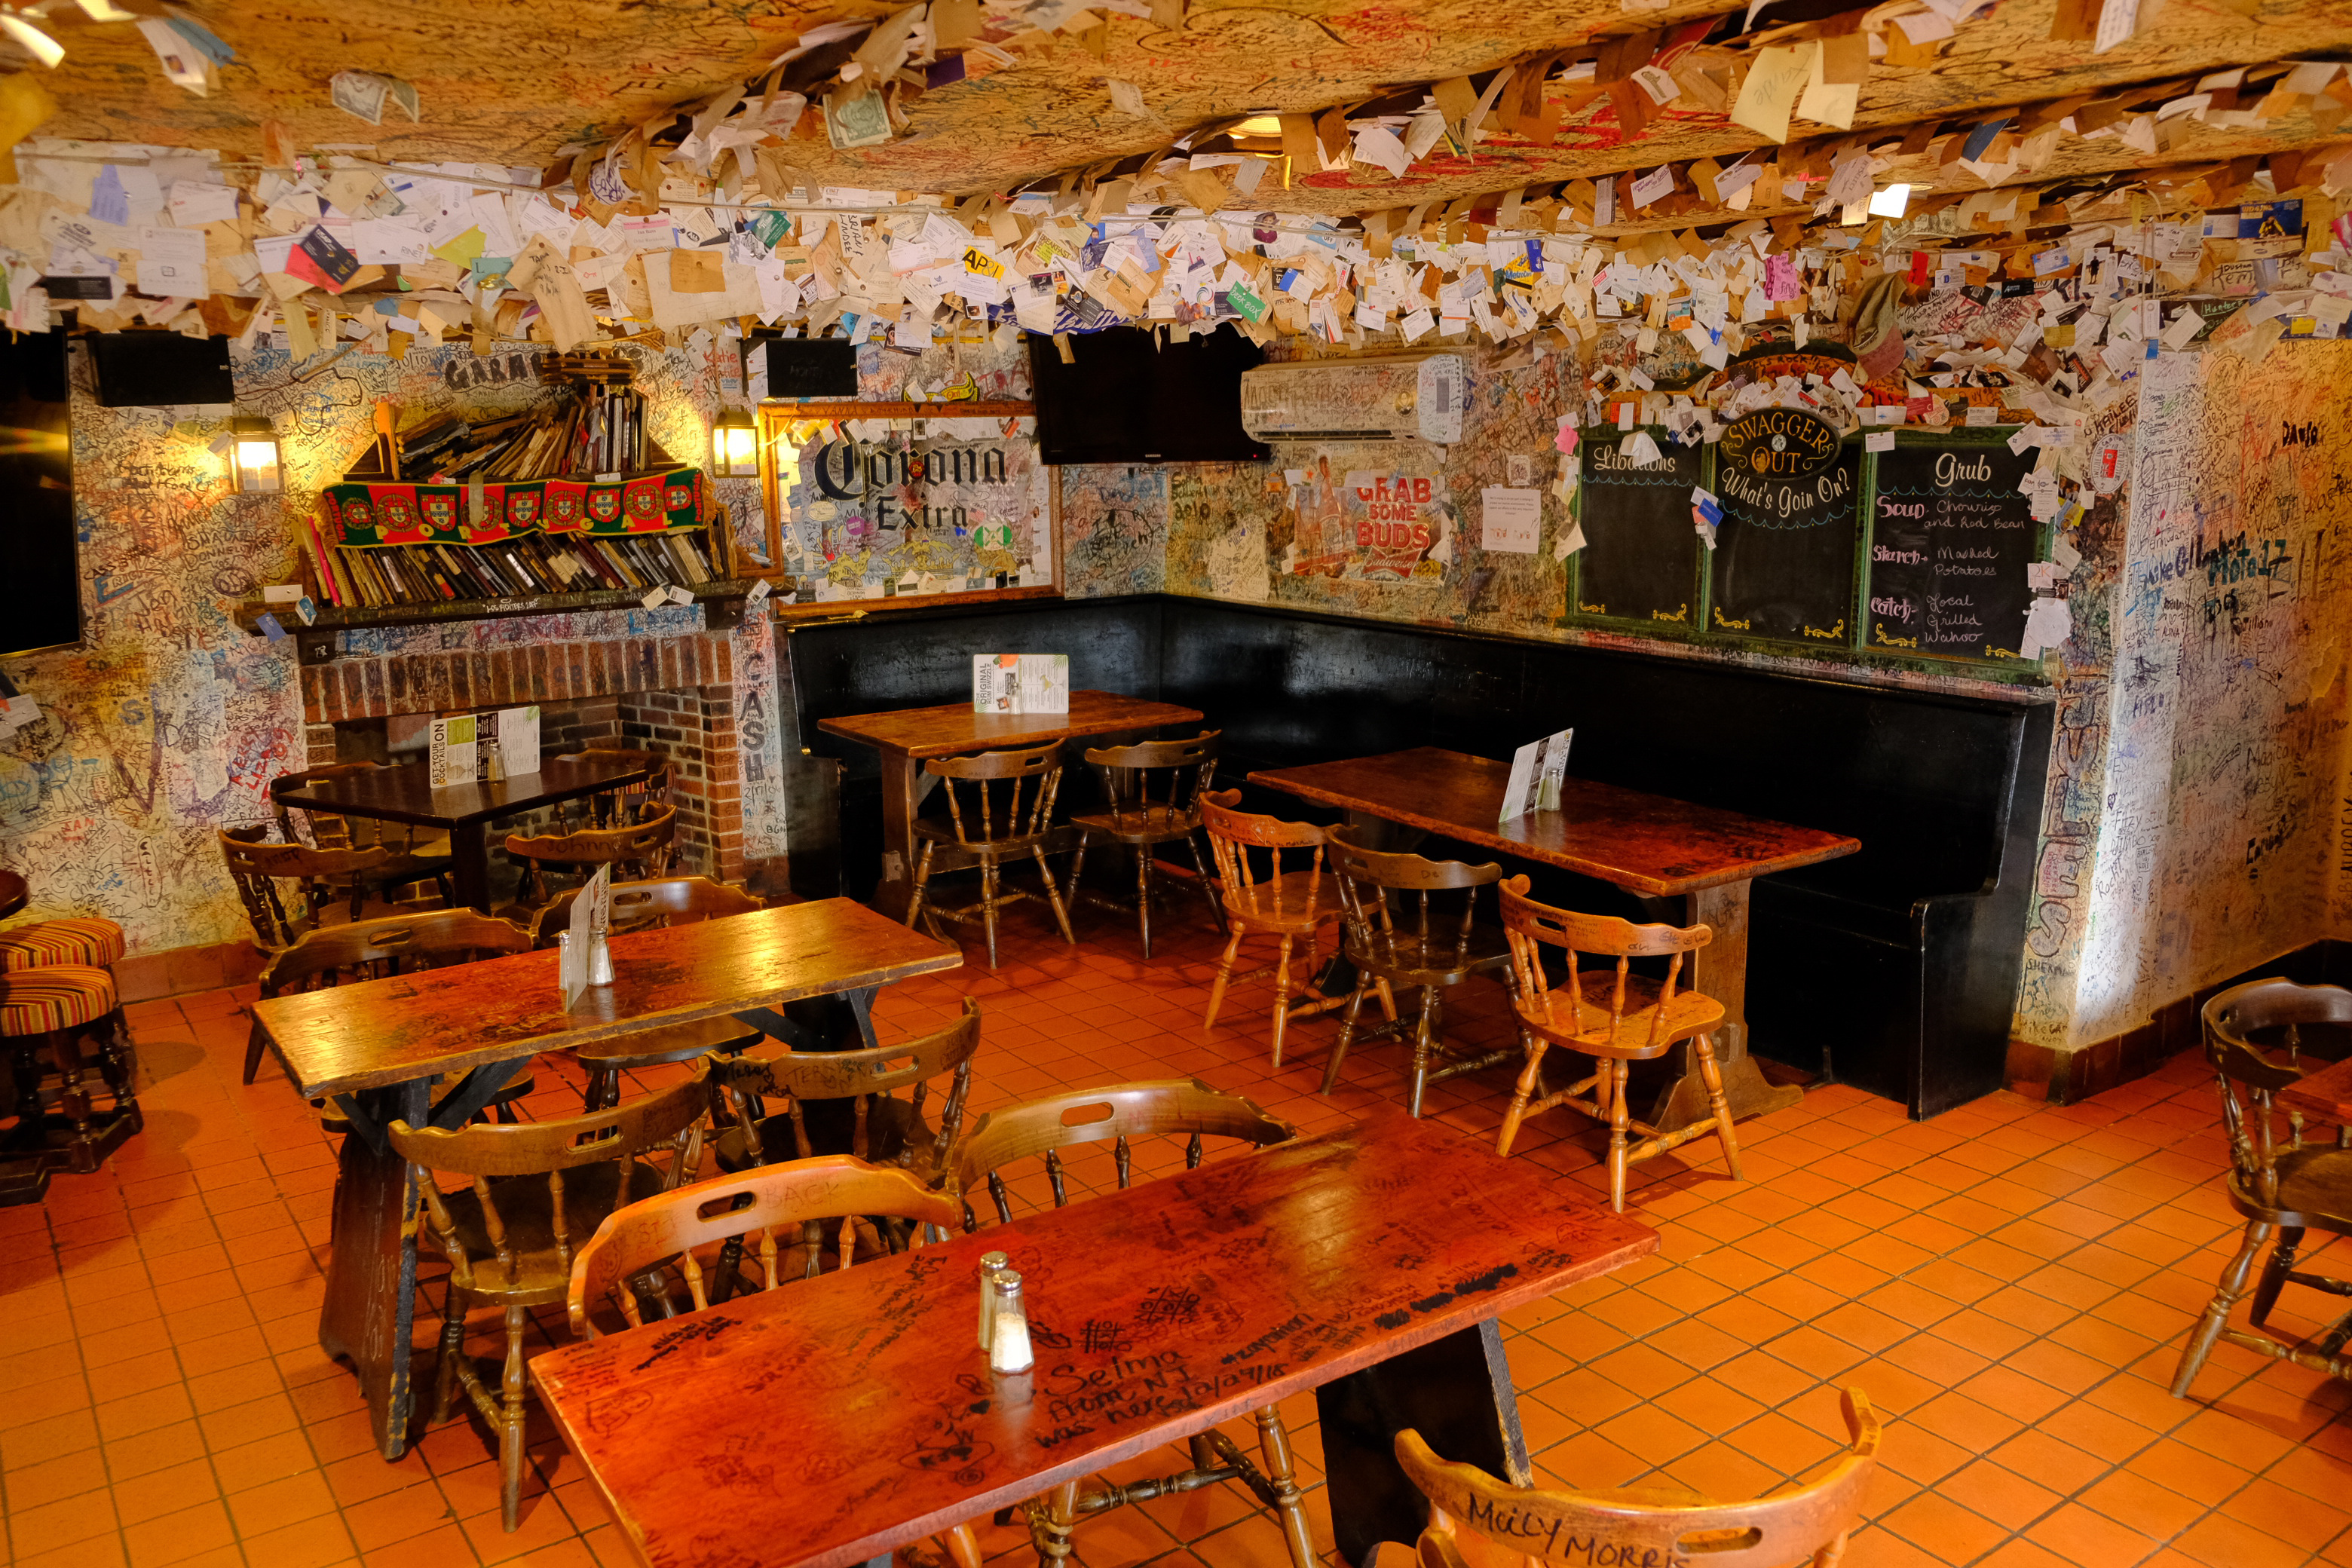 The Swizzle Inn